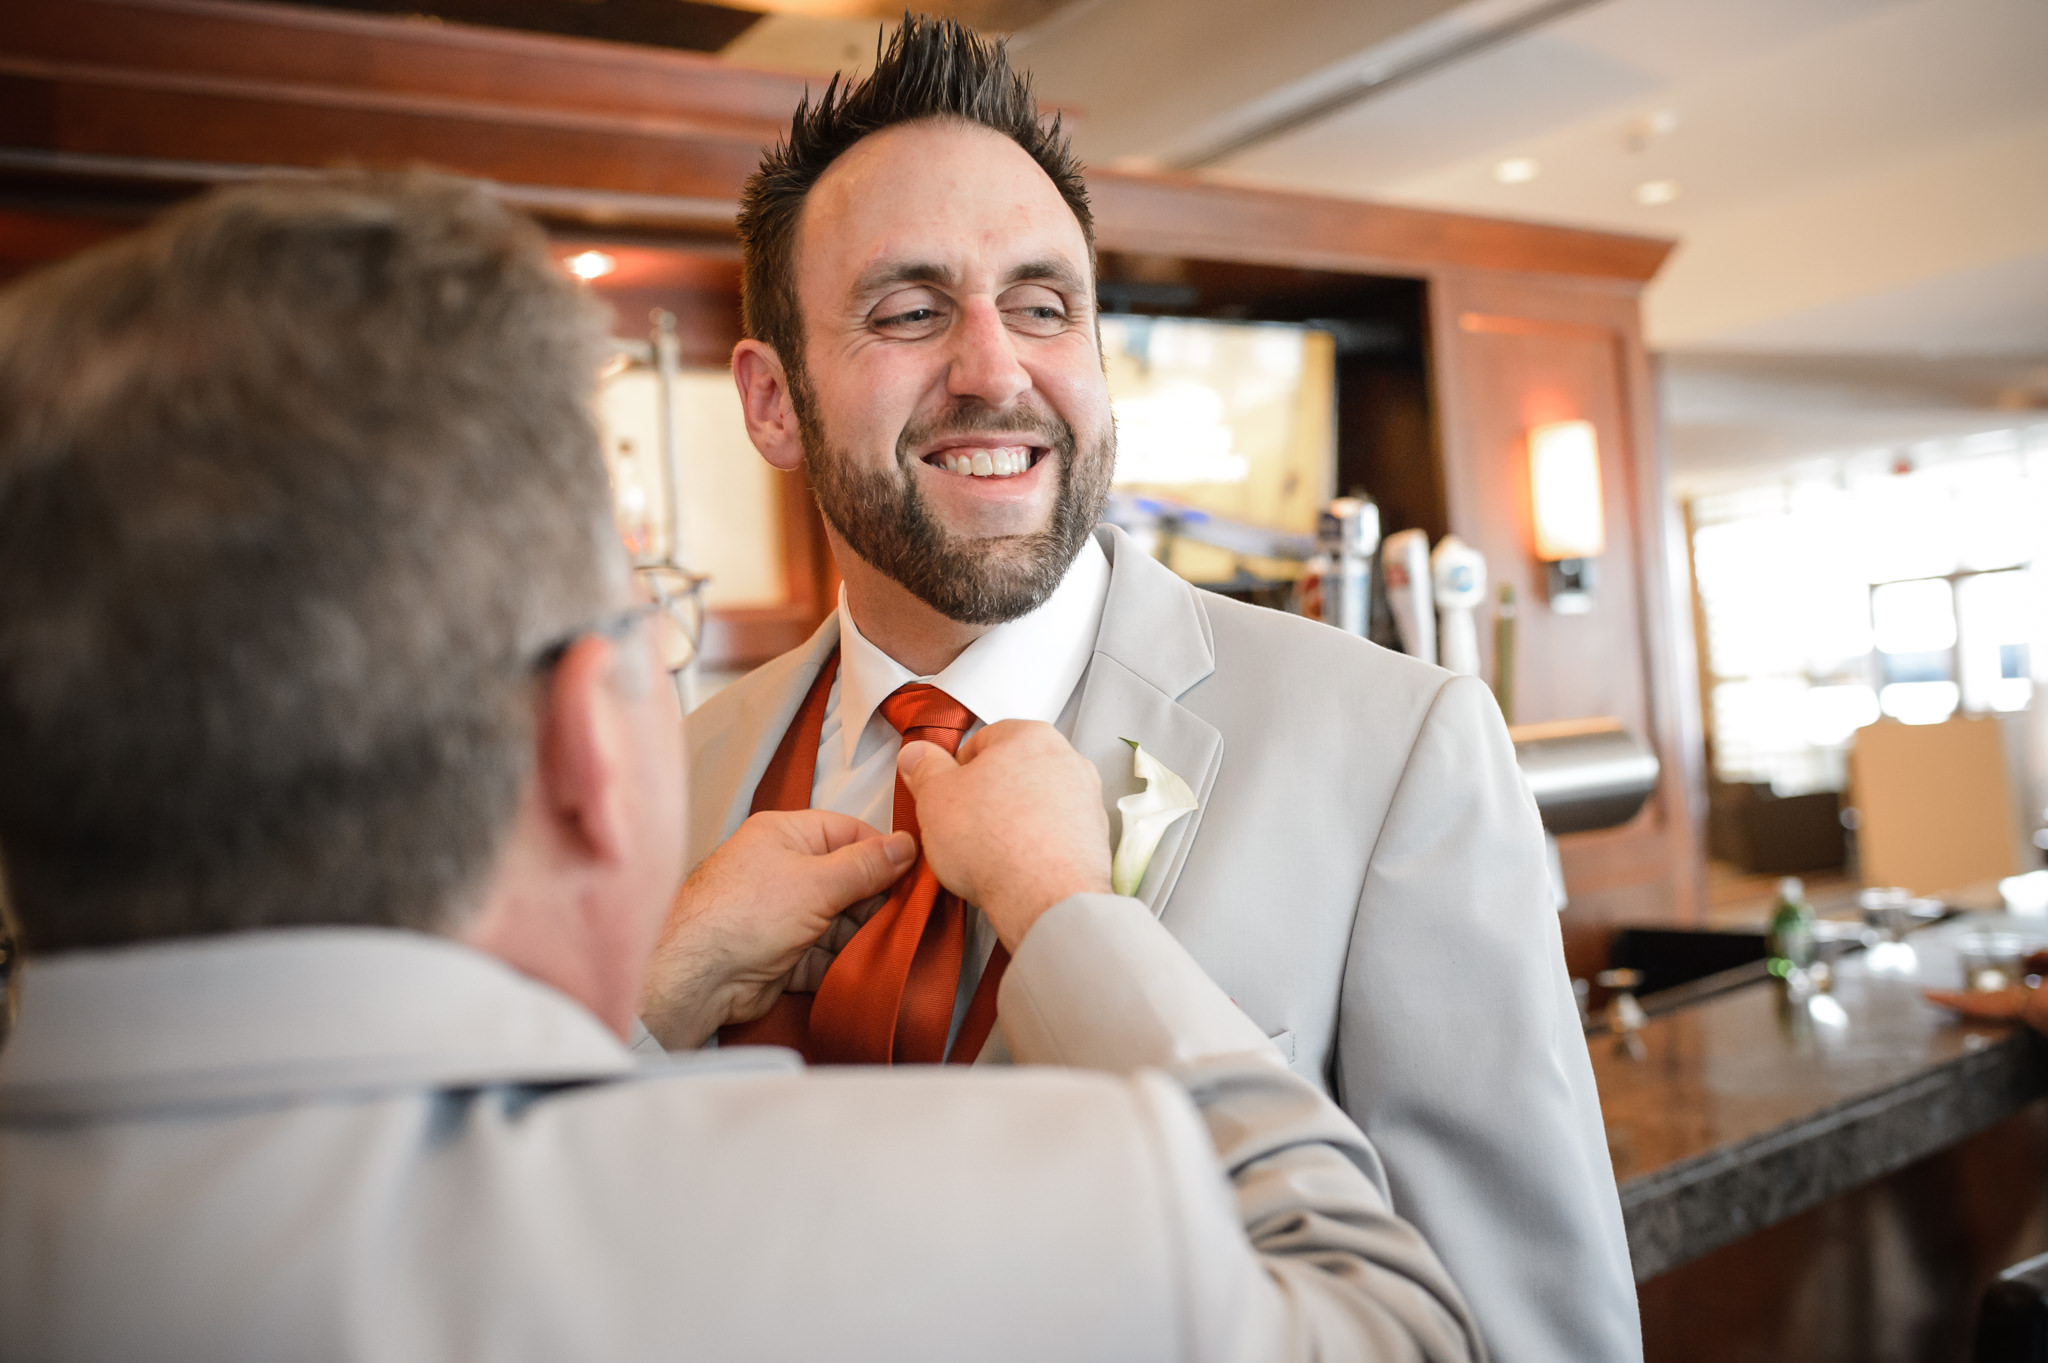 HILTON-OMAHA-WEDDING-PHOTOGRAPHER-JM-STUDIOS-OMAHA-LIV-BRICE-005.jpg